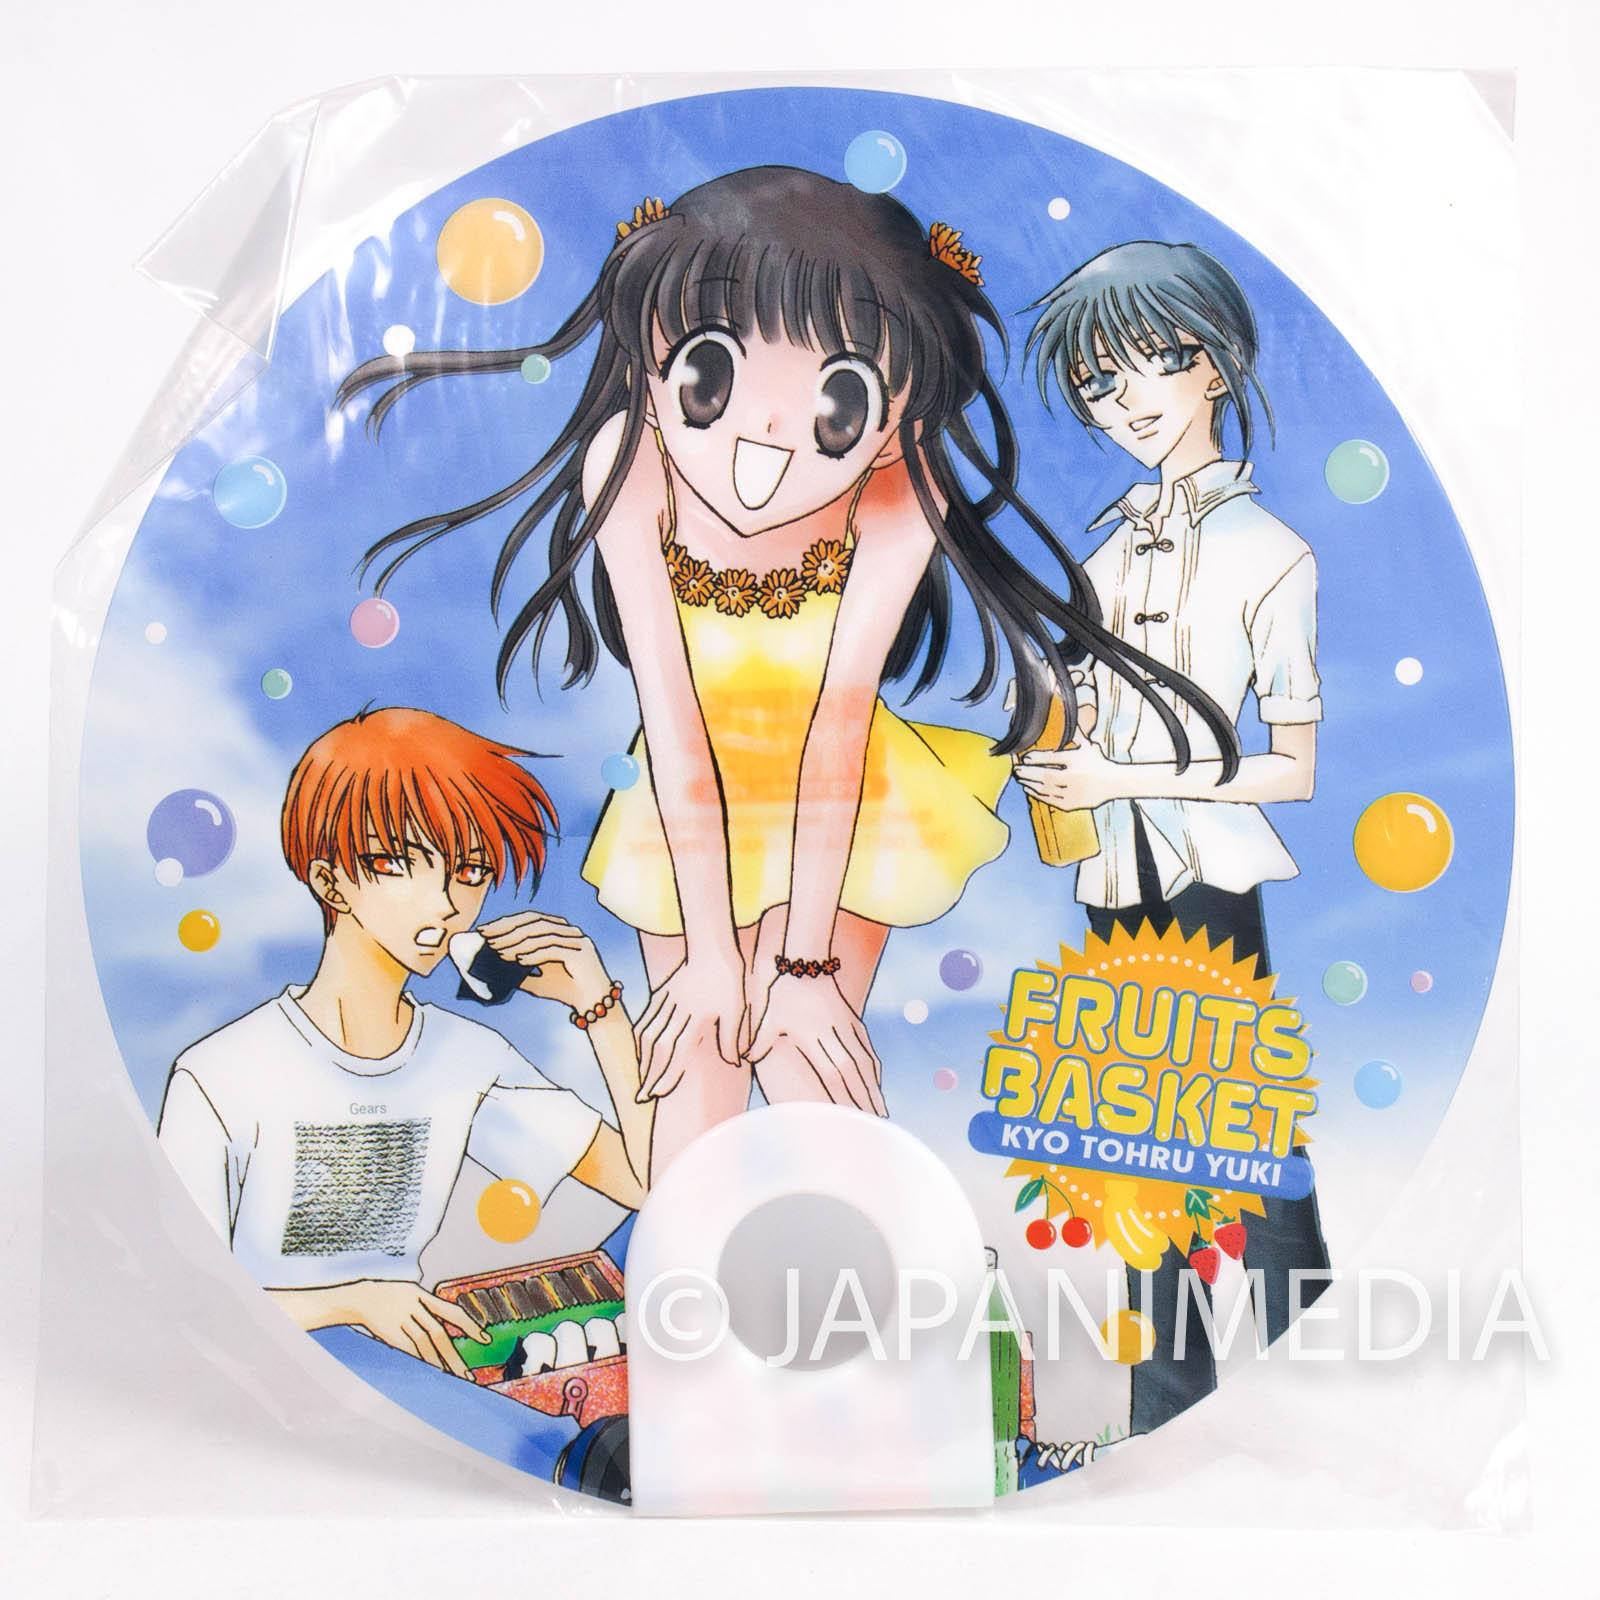 Fruits Basket Uchiwa Round Fan [Tohru / Yuki / Kyo] JAPAN MANGA